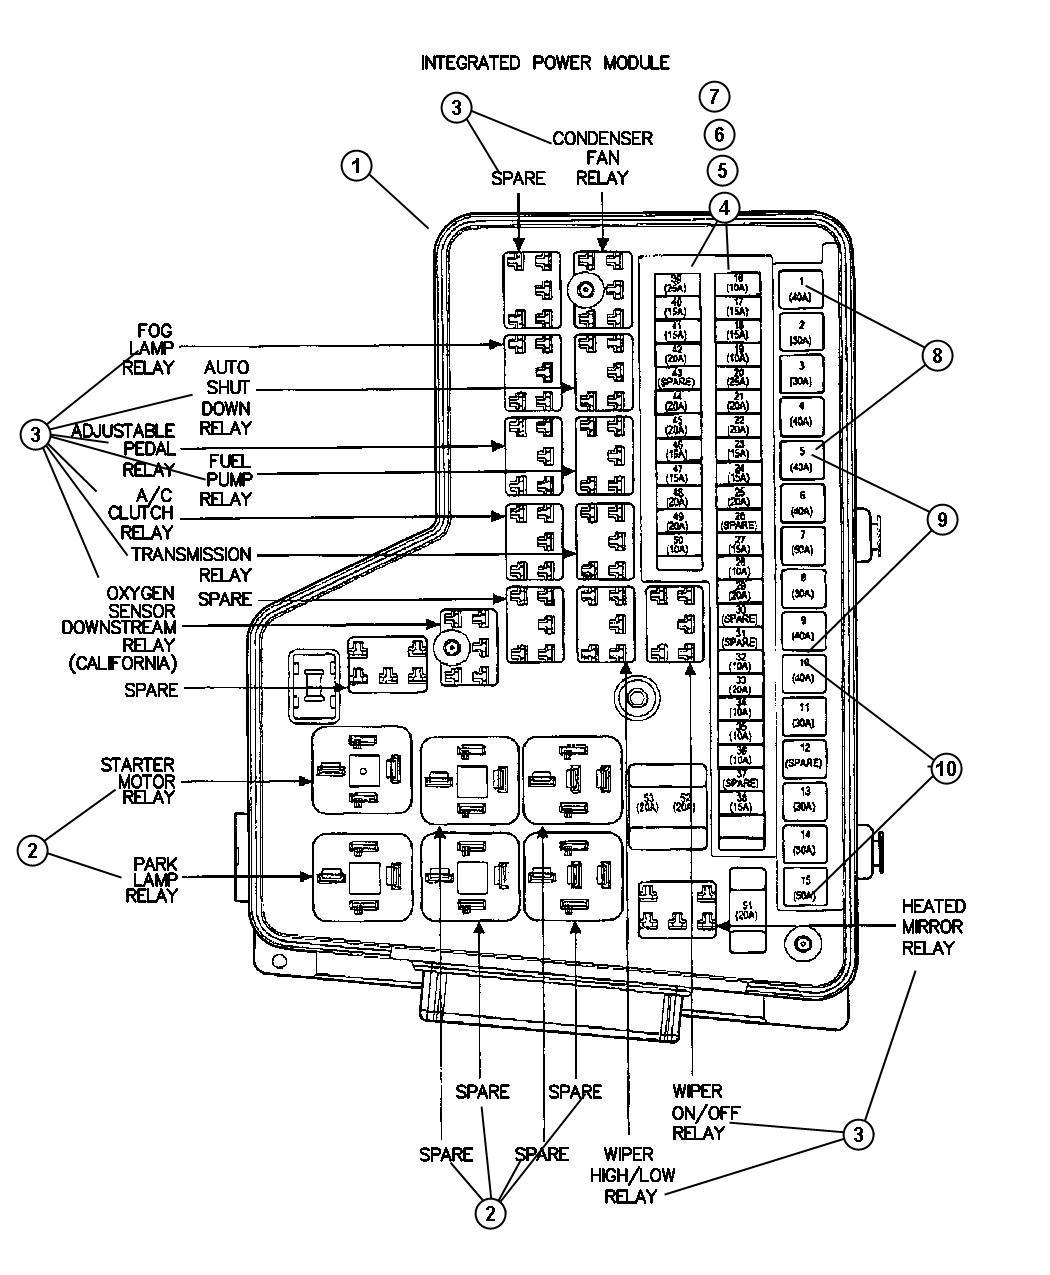 2016 dodge caravan trailer wiring diagram vw sharan towbar for ram towing mirrors get